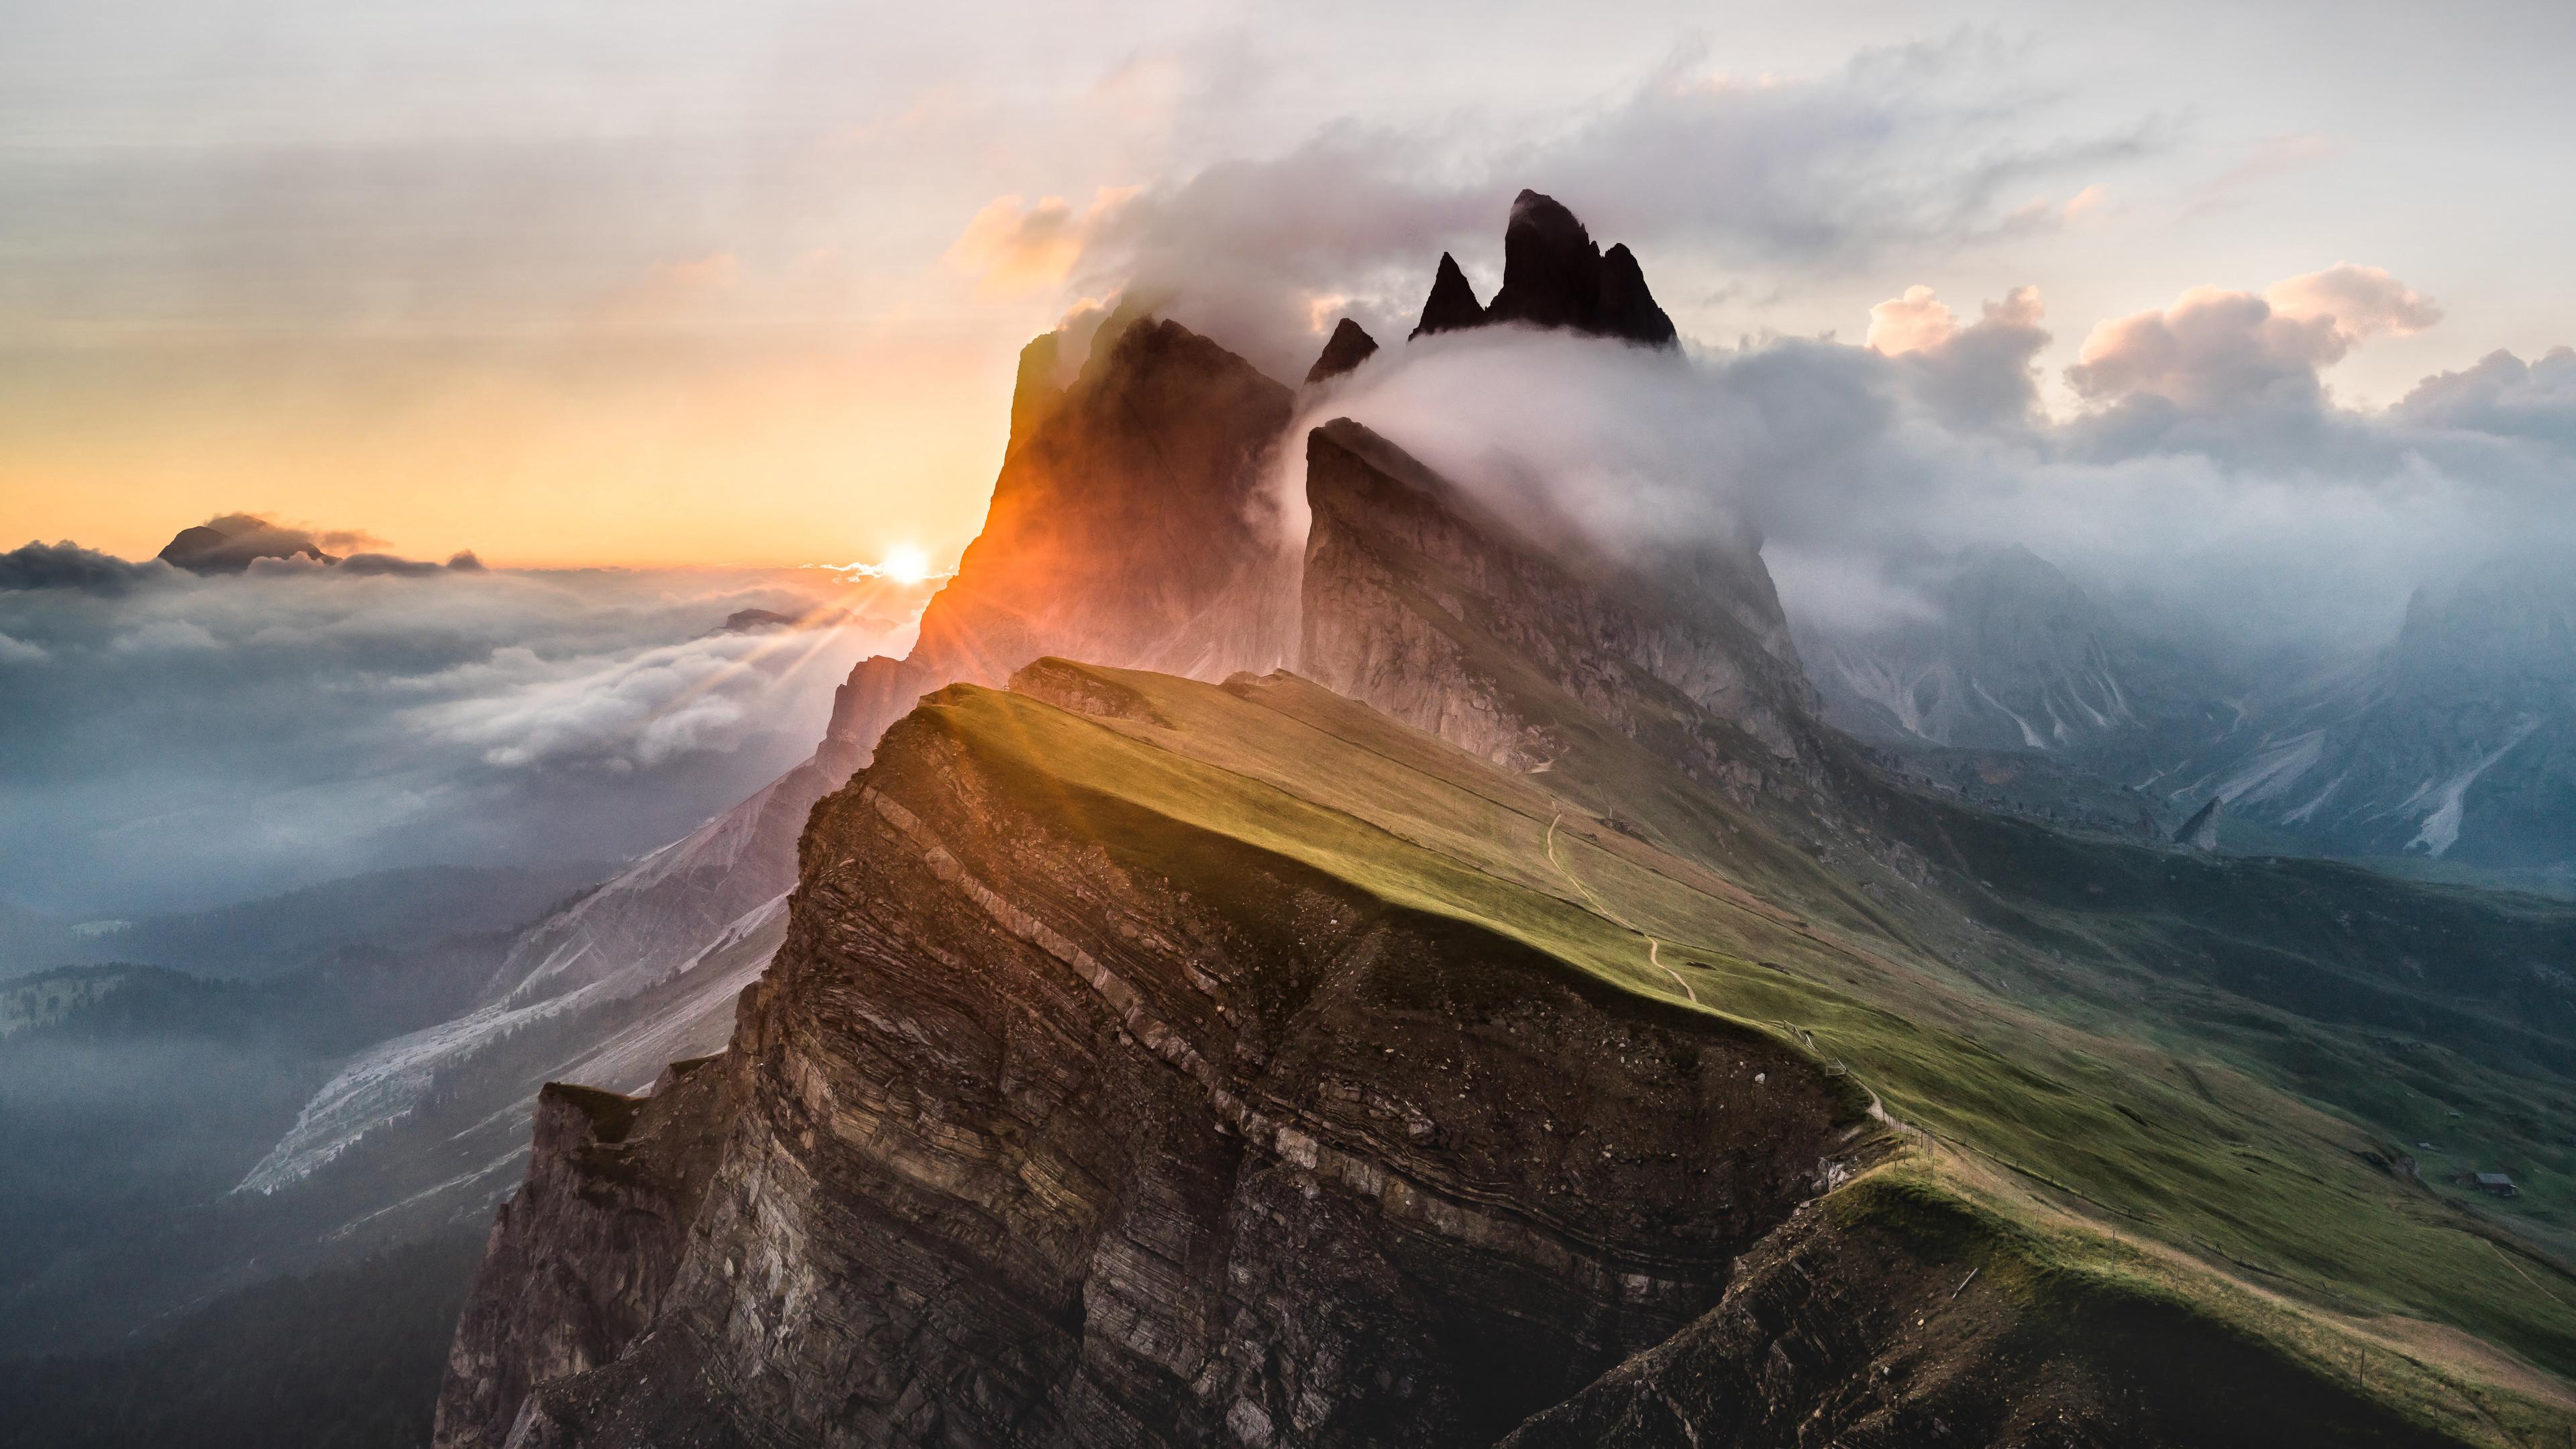 dolomites mountain range 5k sony bravia tv original oled 1540133035 - Dolomites Mountain Range 5k Sony Bravia Tv Original OLED - nature wallpapers, mountains wallpapers, hd-wallpapers, 5k wallpapers, 4k-wallpapers